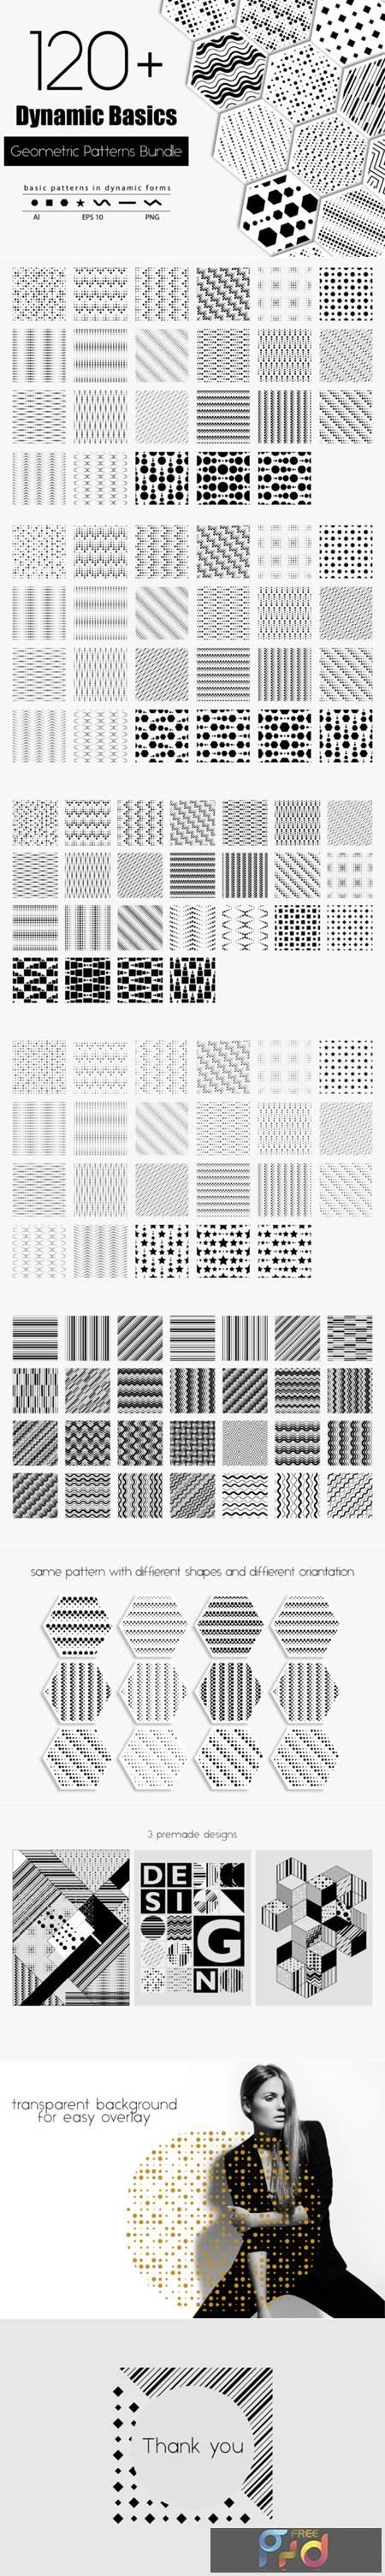 Dynamic Basics- Geometric Patterns 8544419 1